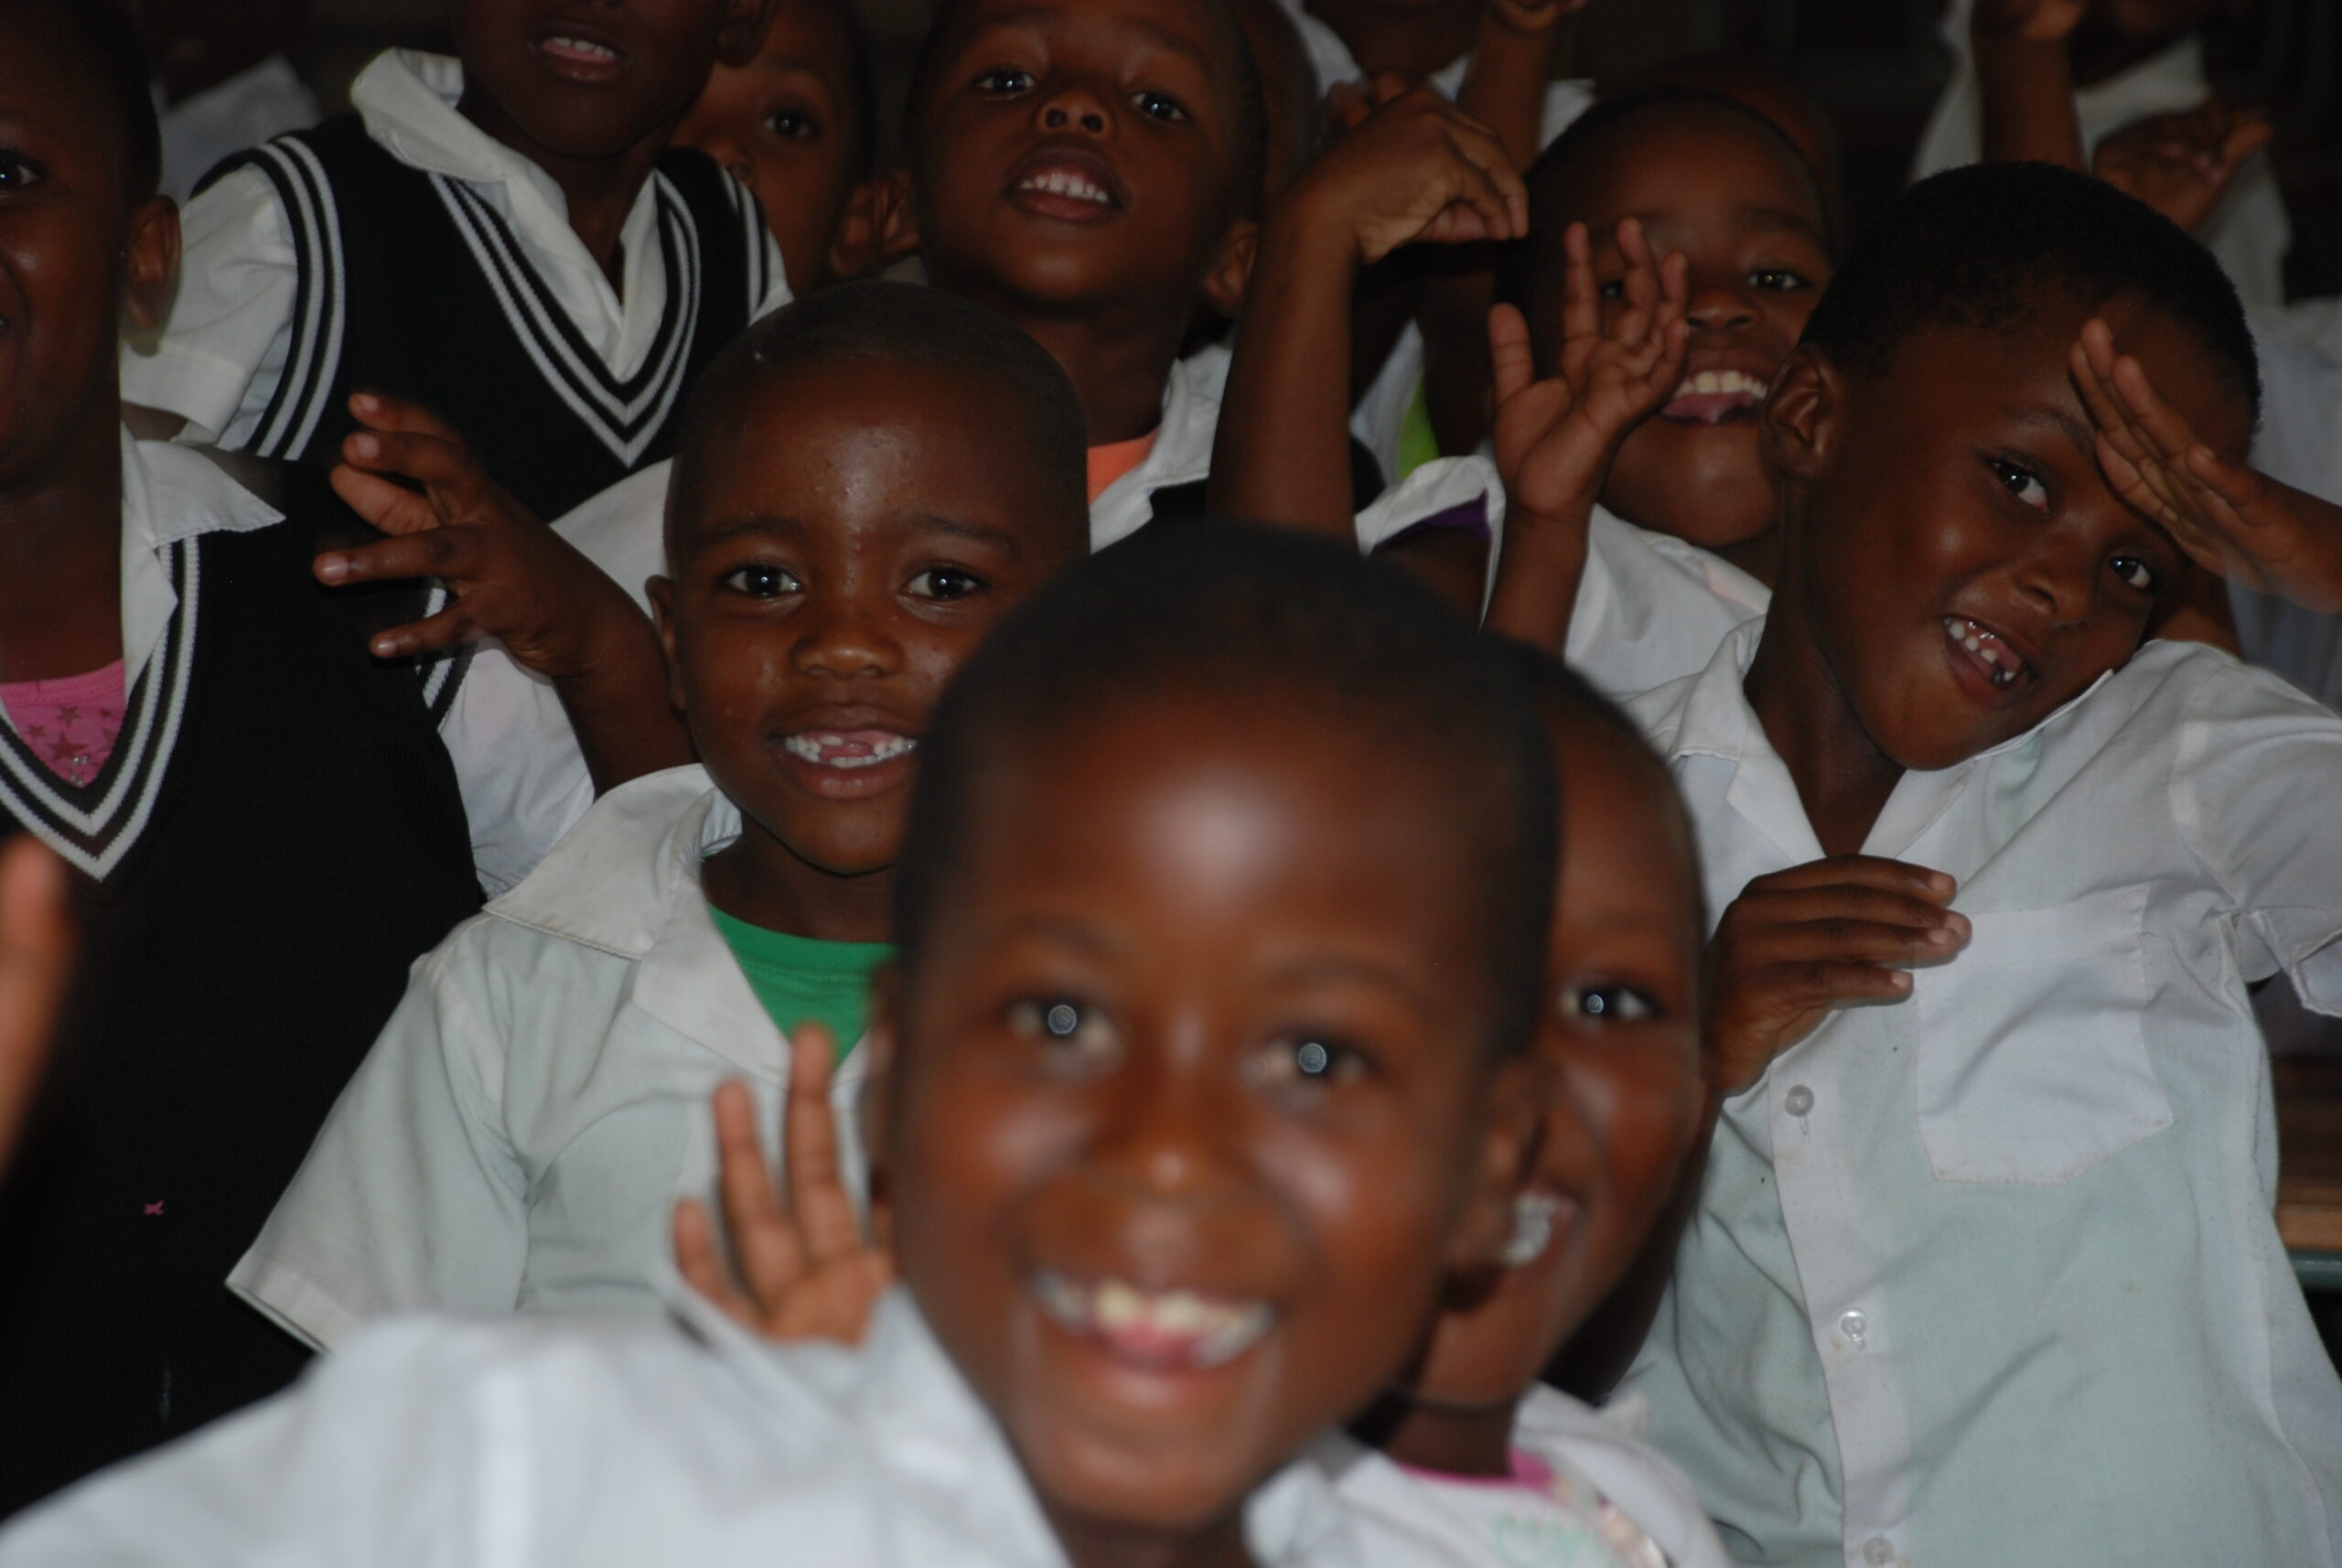 Afrikaner Schulklasse Ozeanien Tours